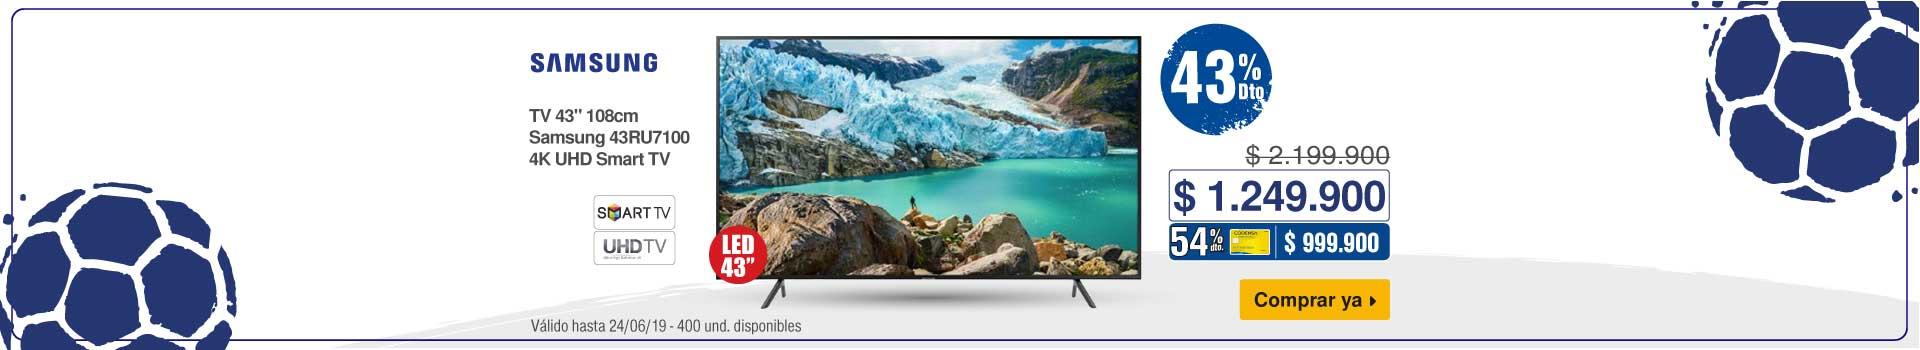 AK-TV-SAMSUNG-43RU7100-HiperOfertas_TV_Video2-22JUN